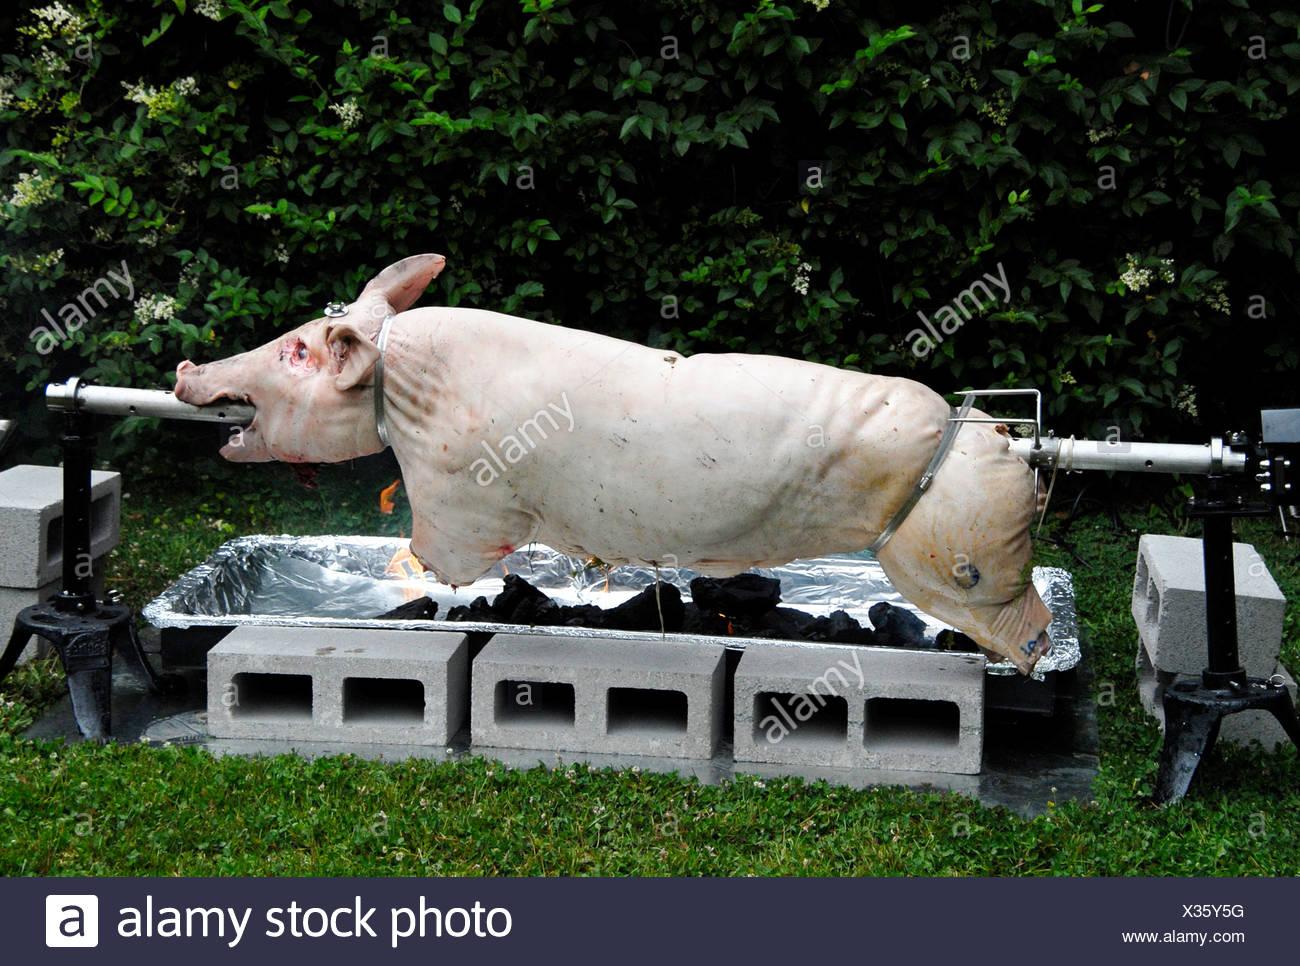 Pig on spit - Stock Image